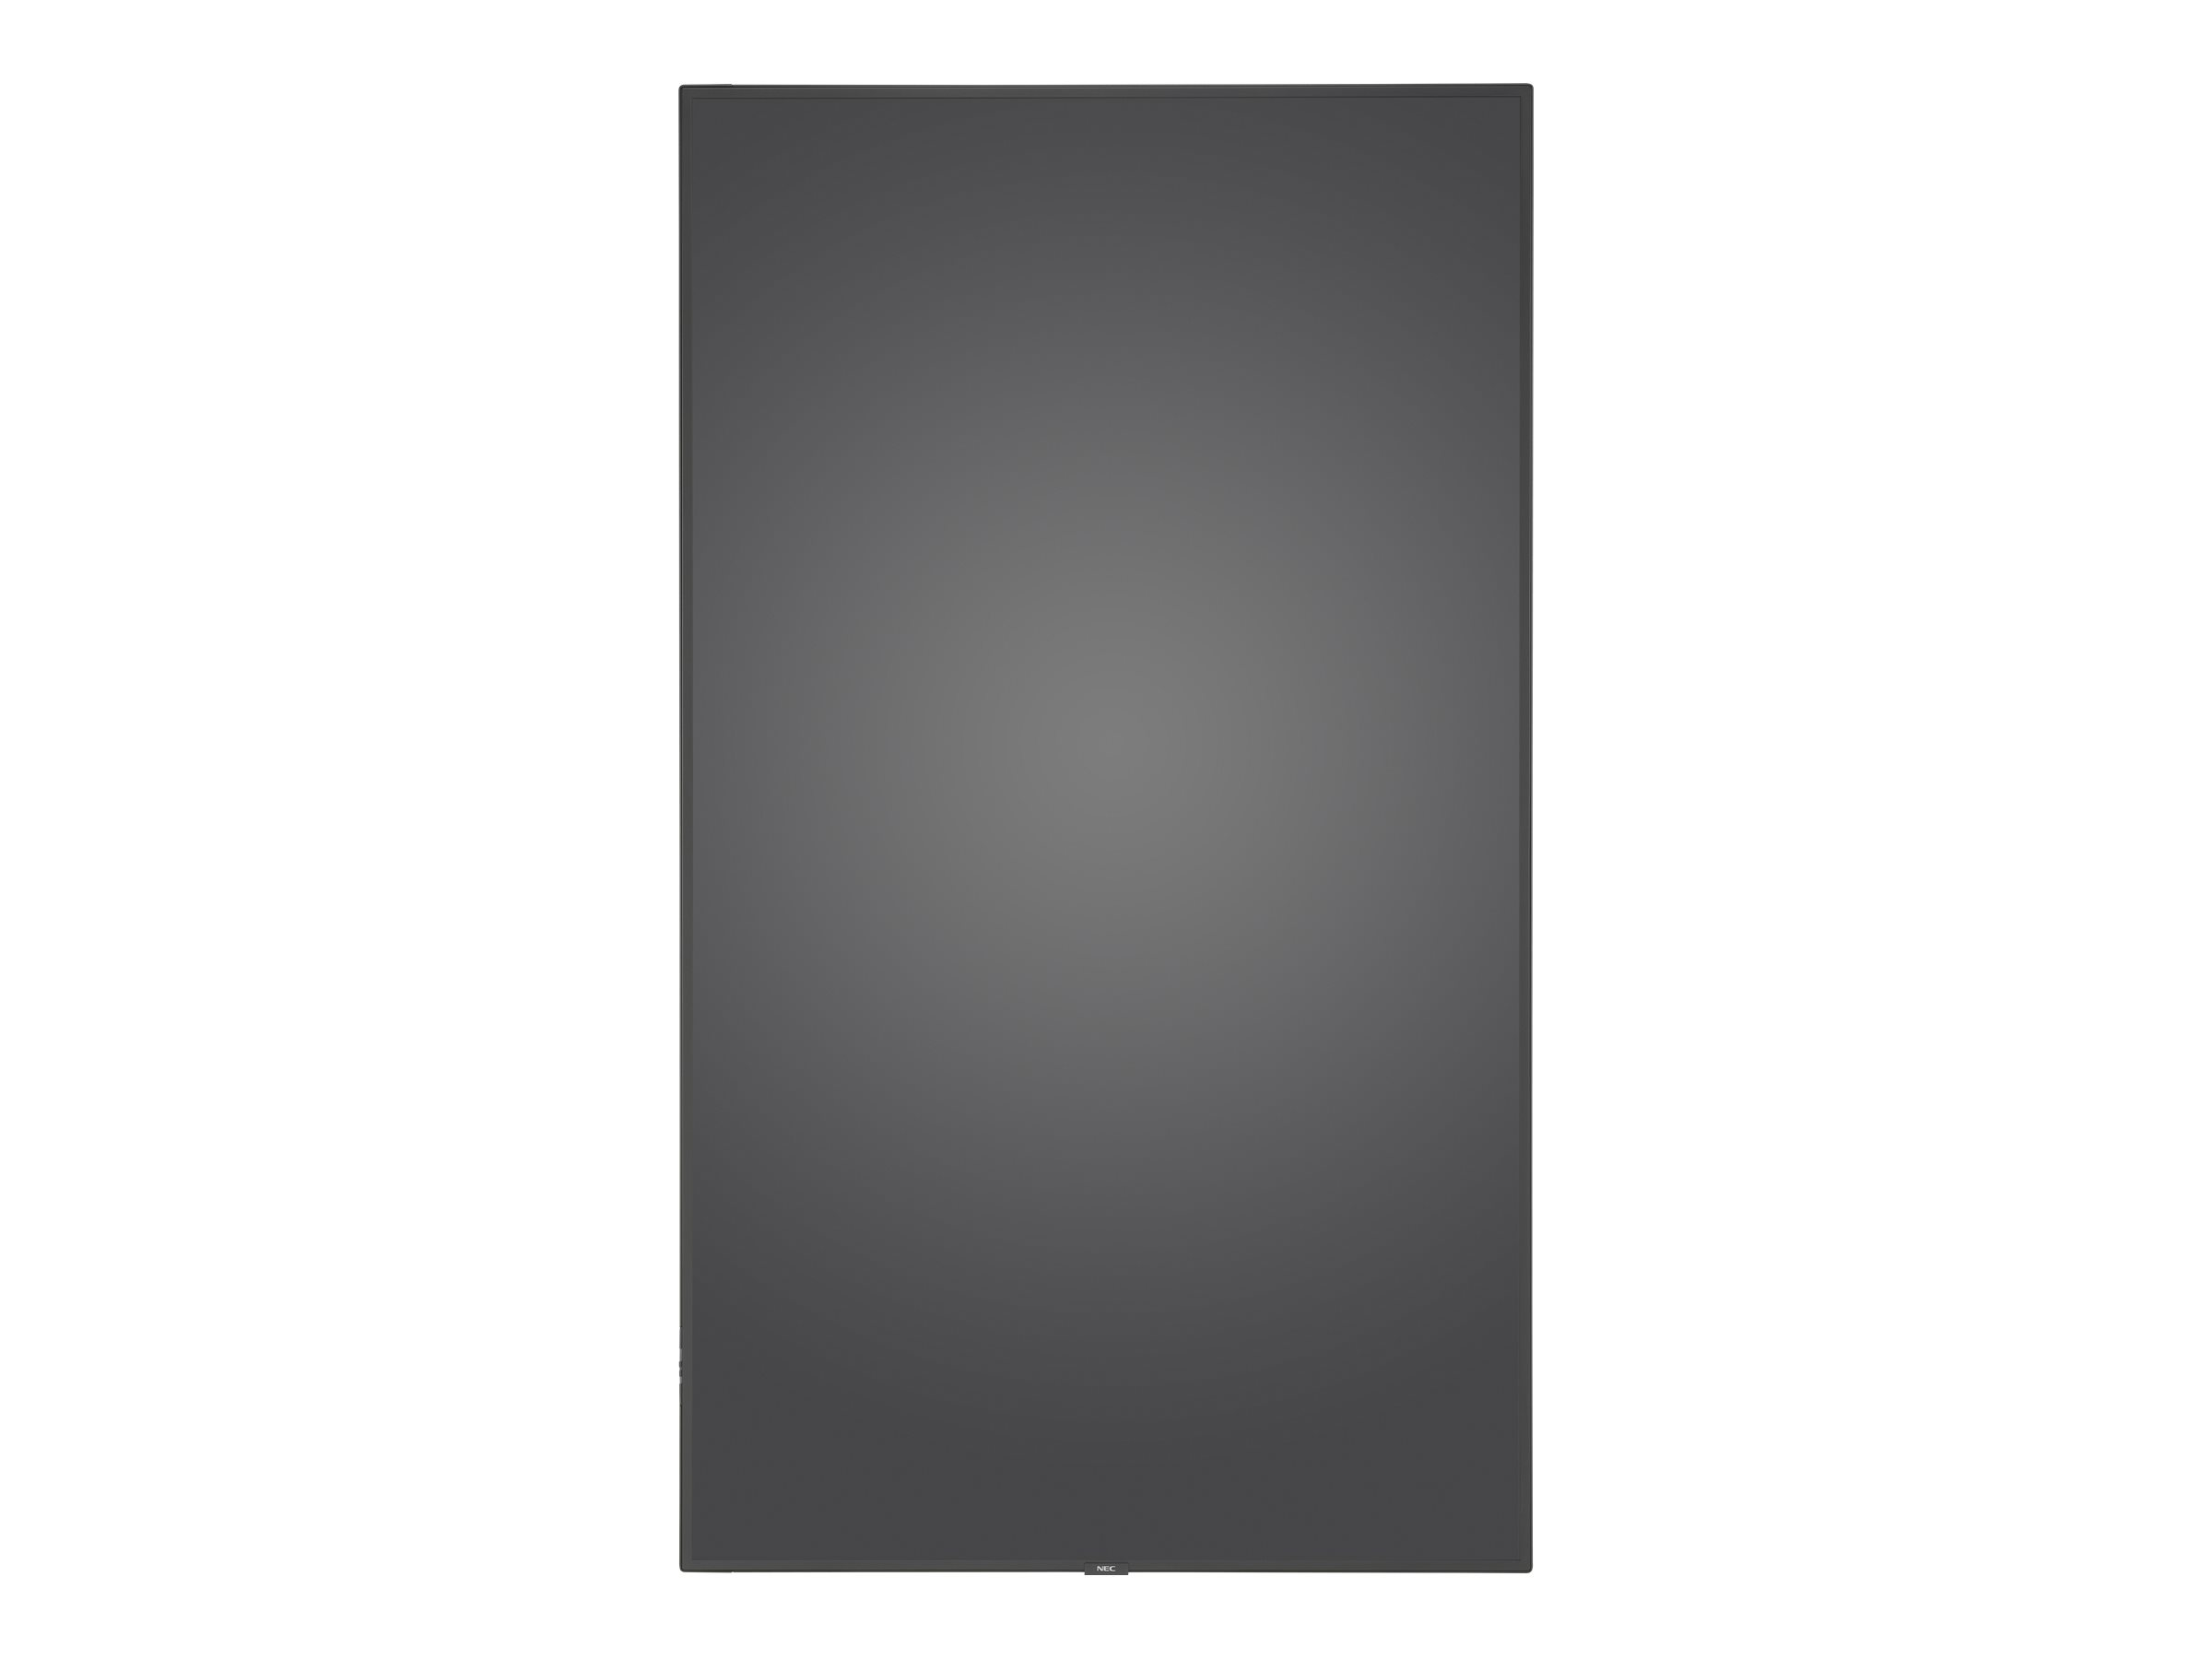 NEC MultiSync V754Q - 189 cm (75